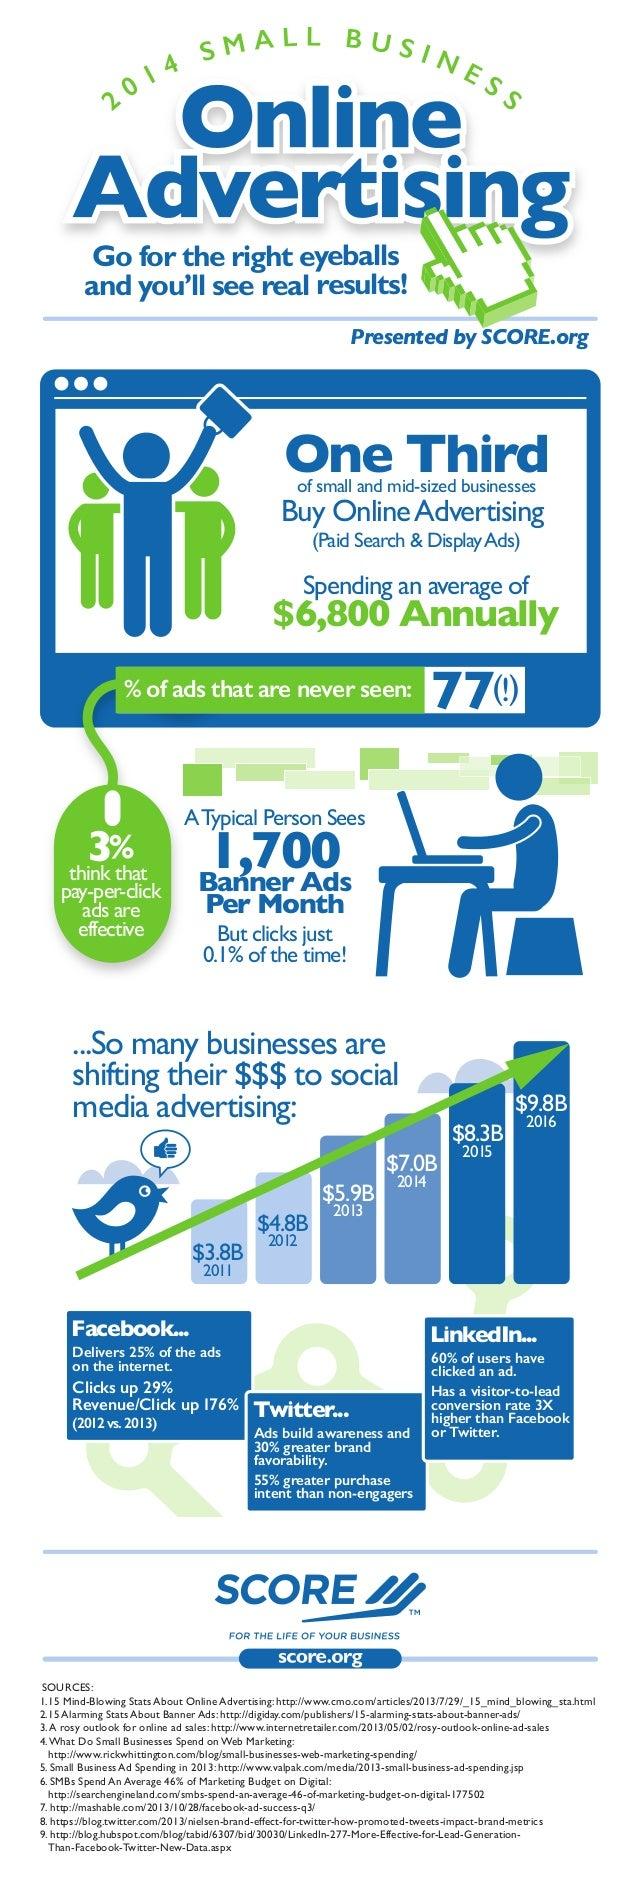 SCORE Infographic: Online Advertising